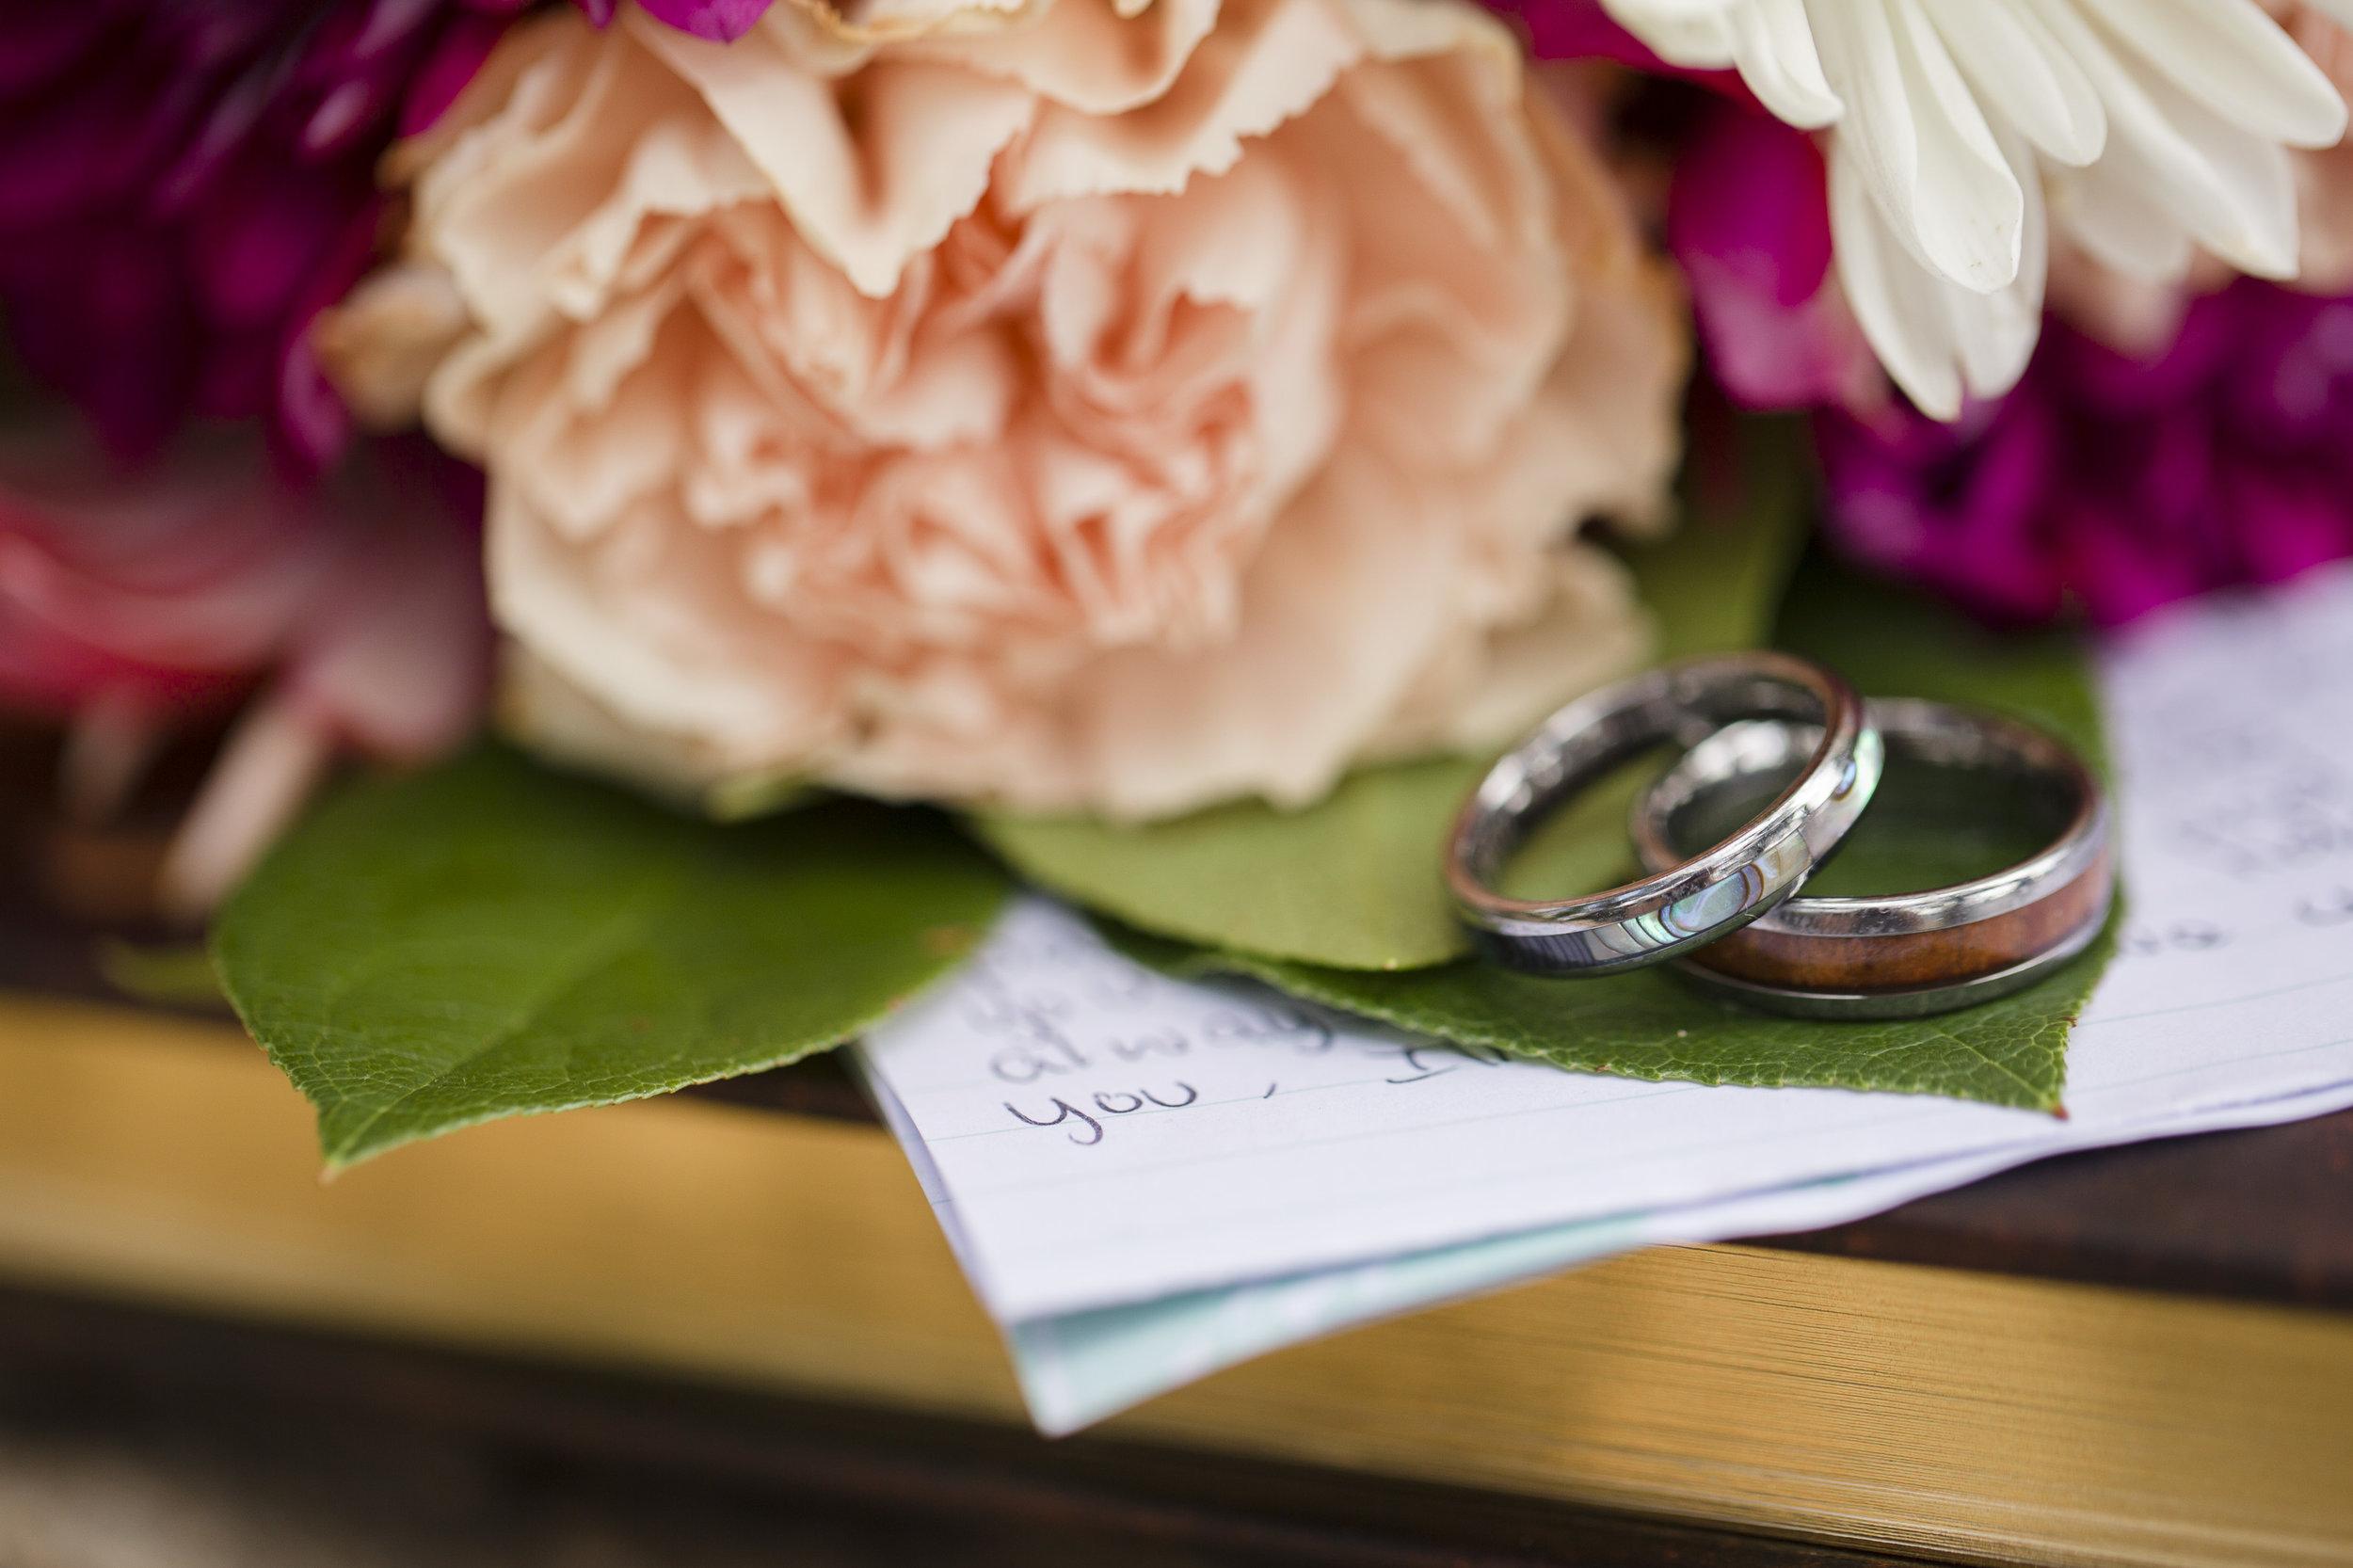 kristen-vance-sapphire-point-wedding-dillon-colorado-2017.jpg